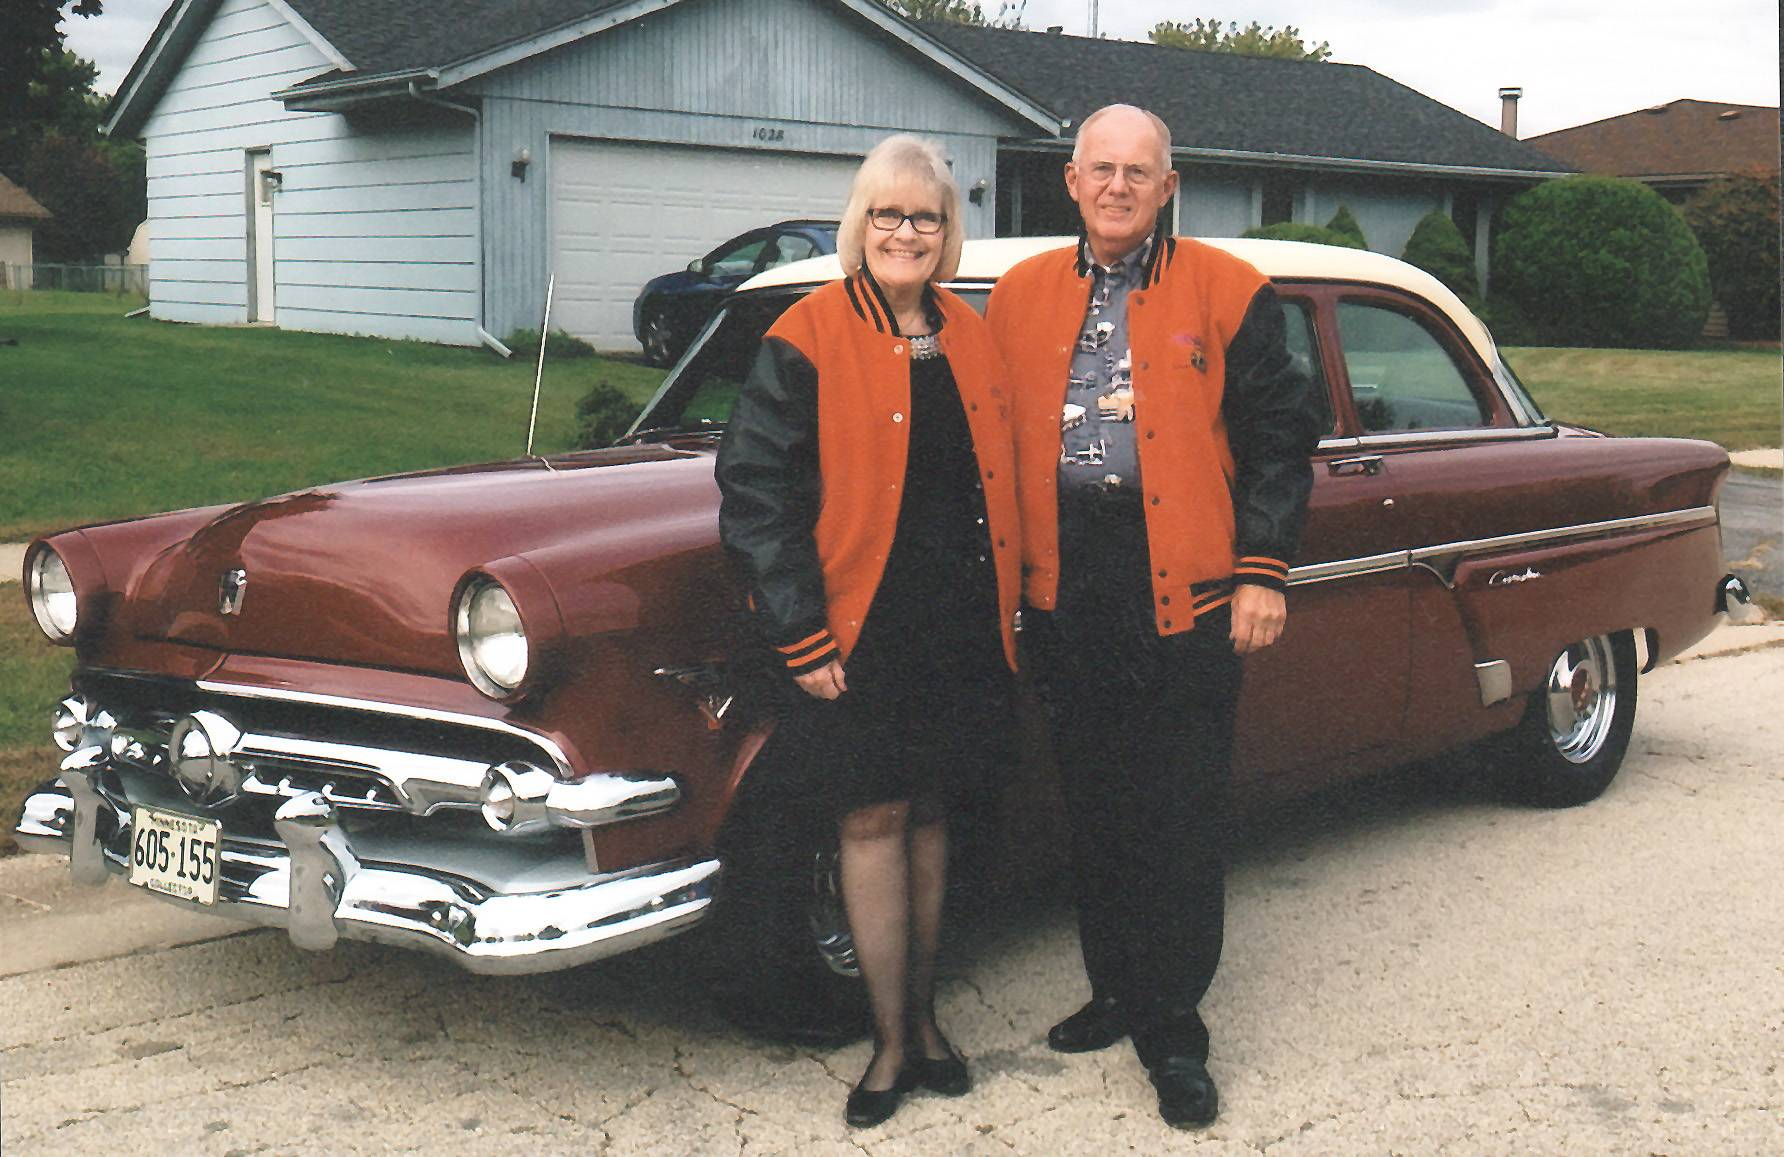 Herb and Lorna Challberg's 1954 Ford 2 dr. Customline sedan